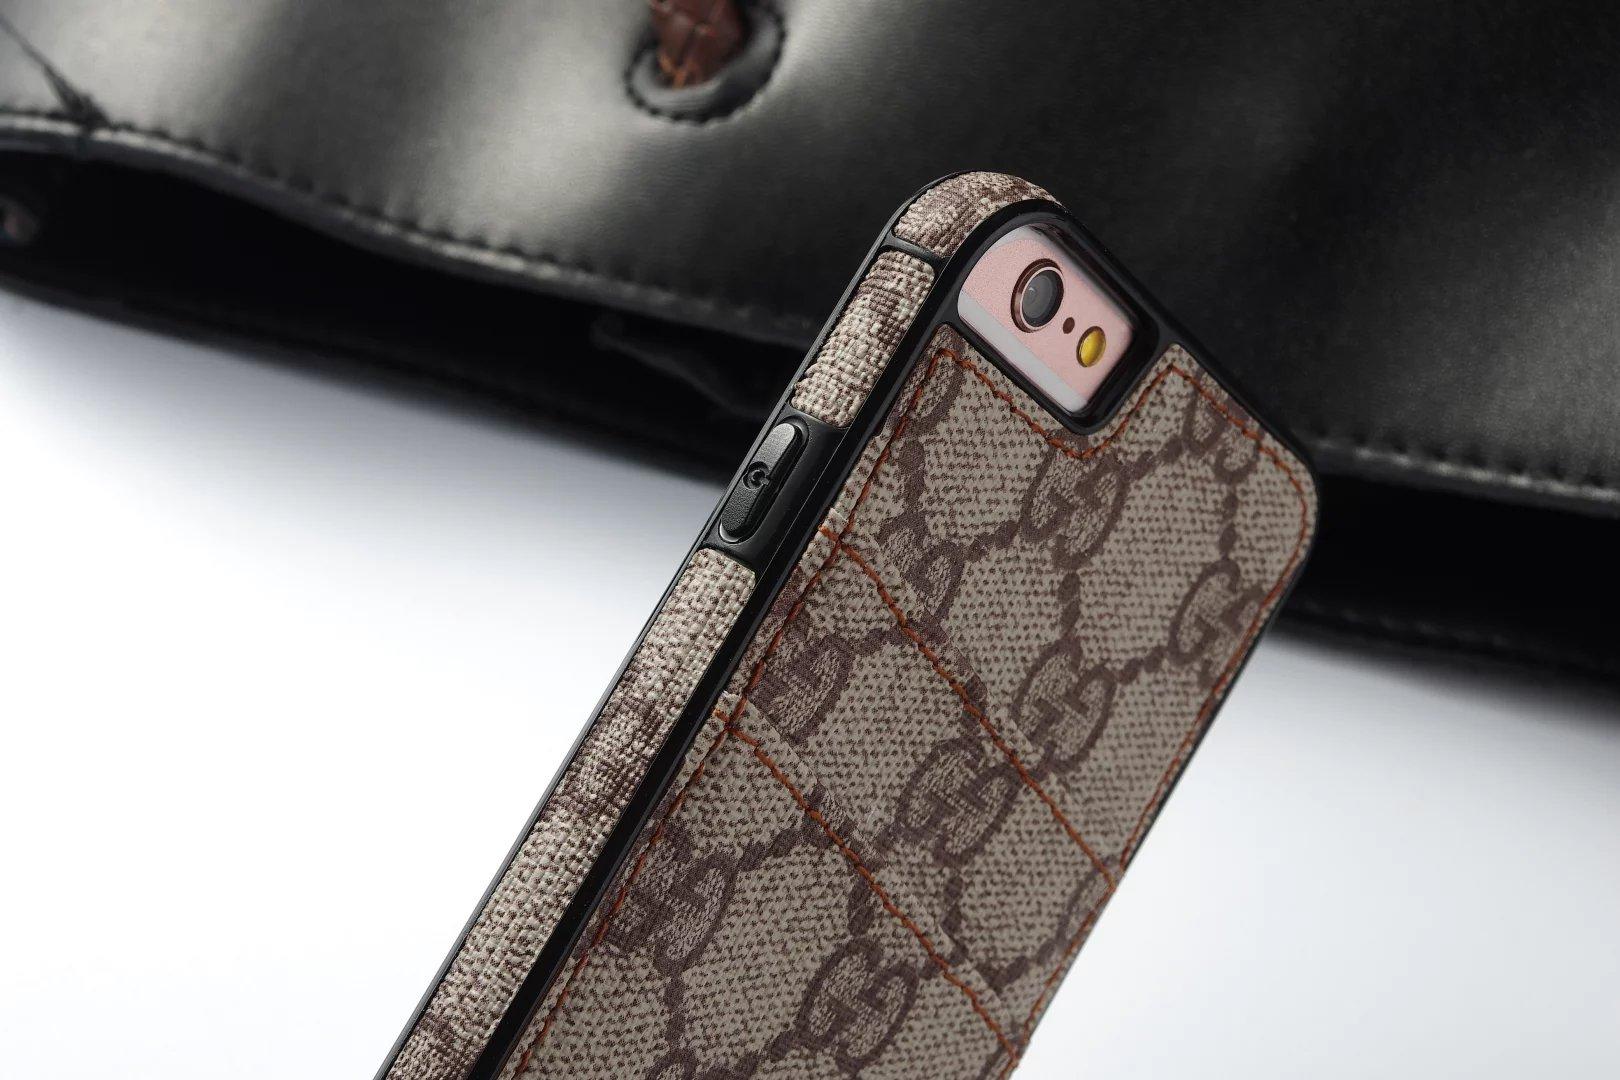 iphone case foto iphone hüllen bestellen Louis Vuitton iphone6s hülle htc one handyhülle 6slbst gestalten handy foto cover iphone 6s a6s original holz cover iphone 6s ipjone 6s iphone 6shs